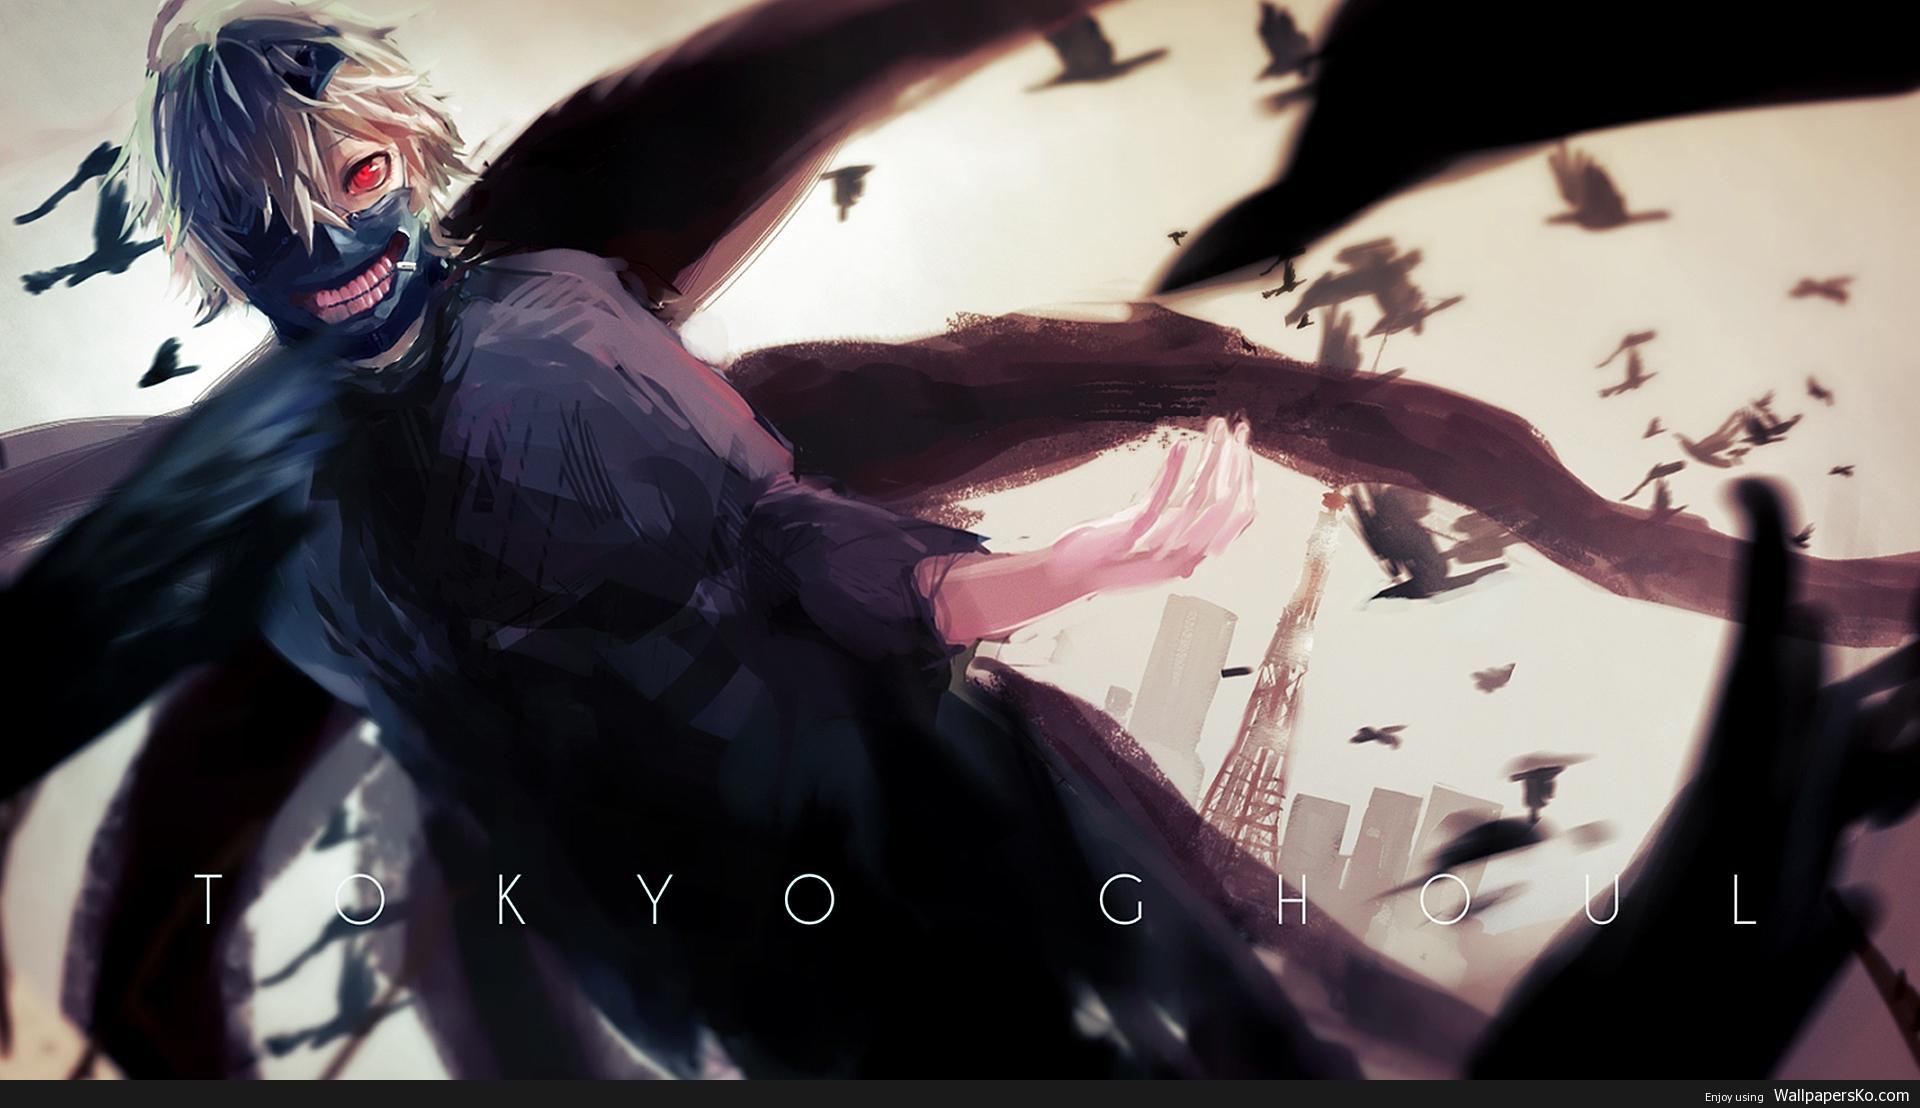 tokyo ghoul 1920x1080